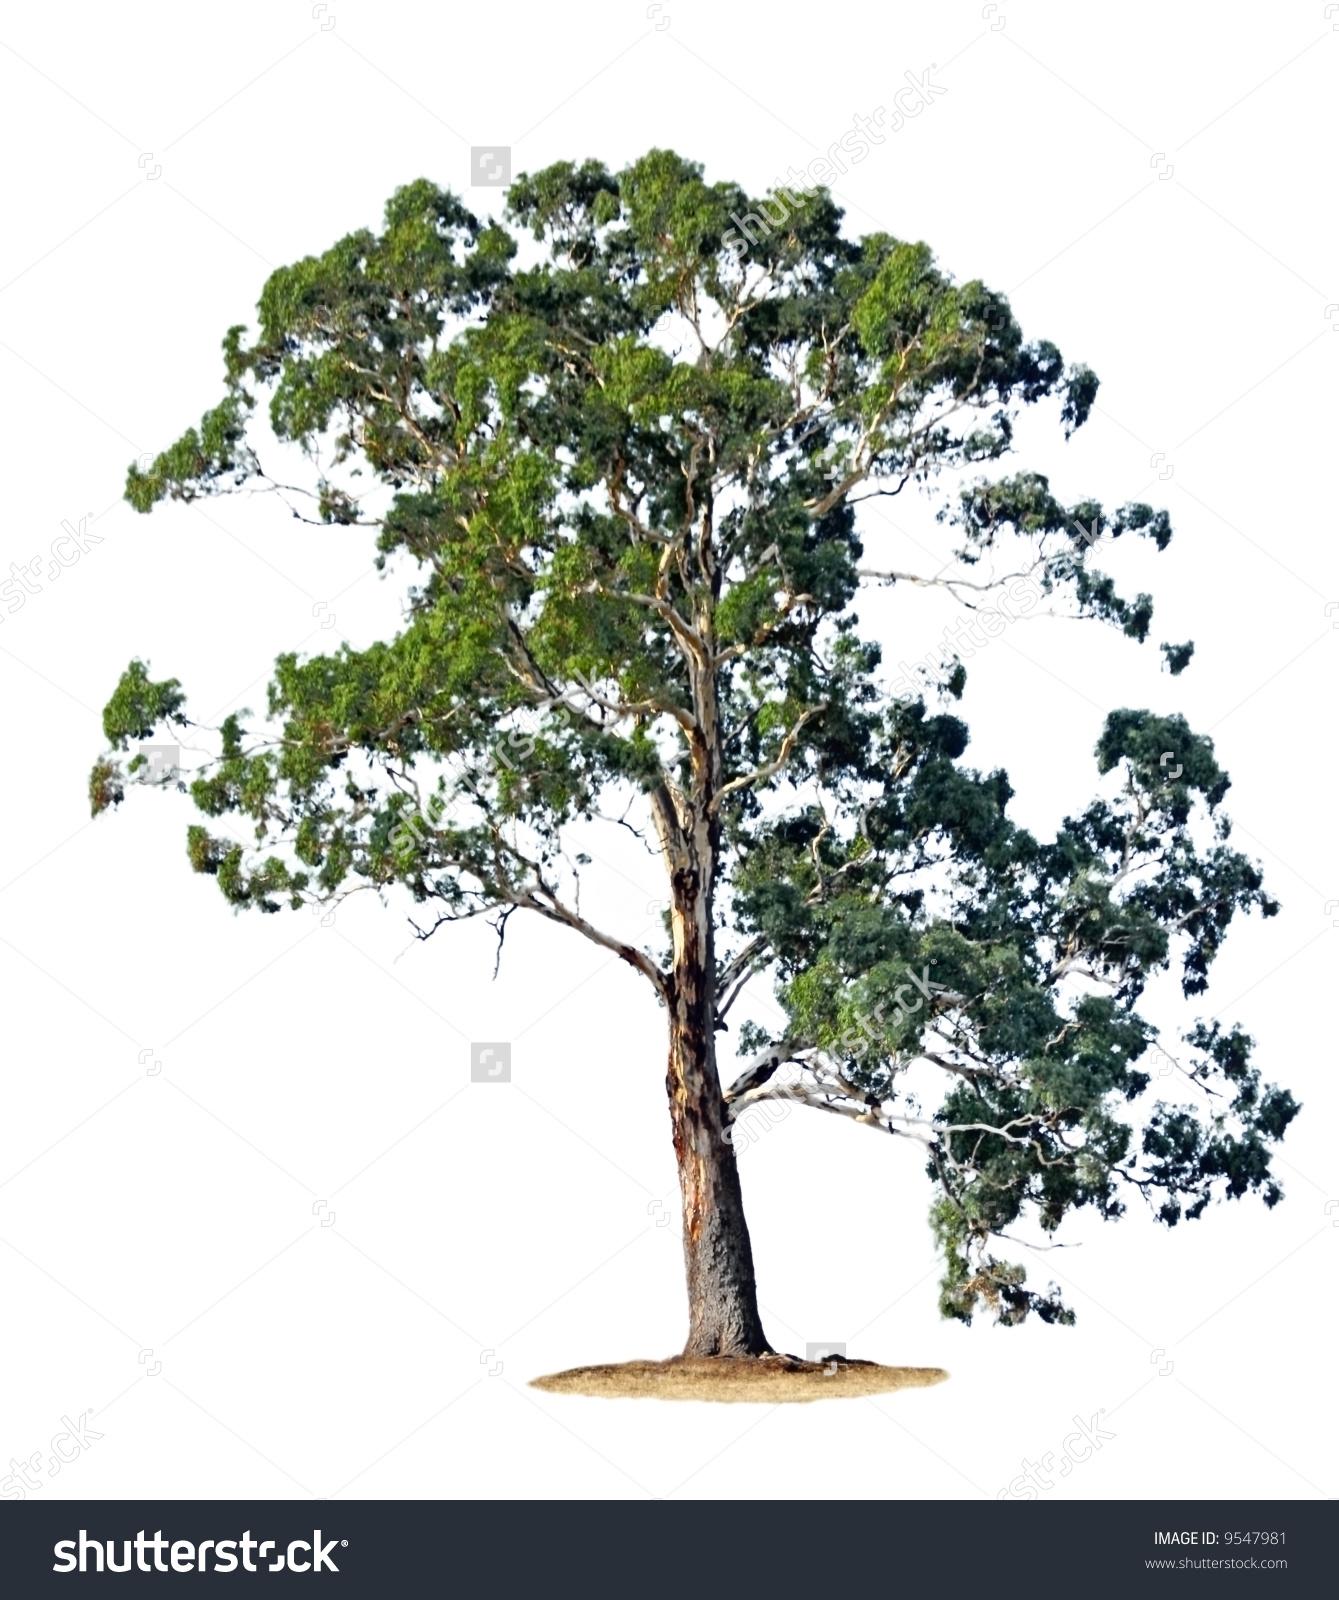 Clipart gum tree pictures.